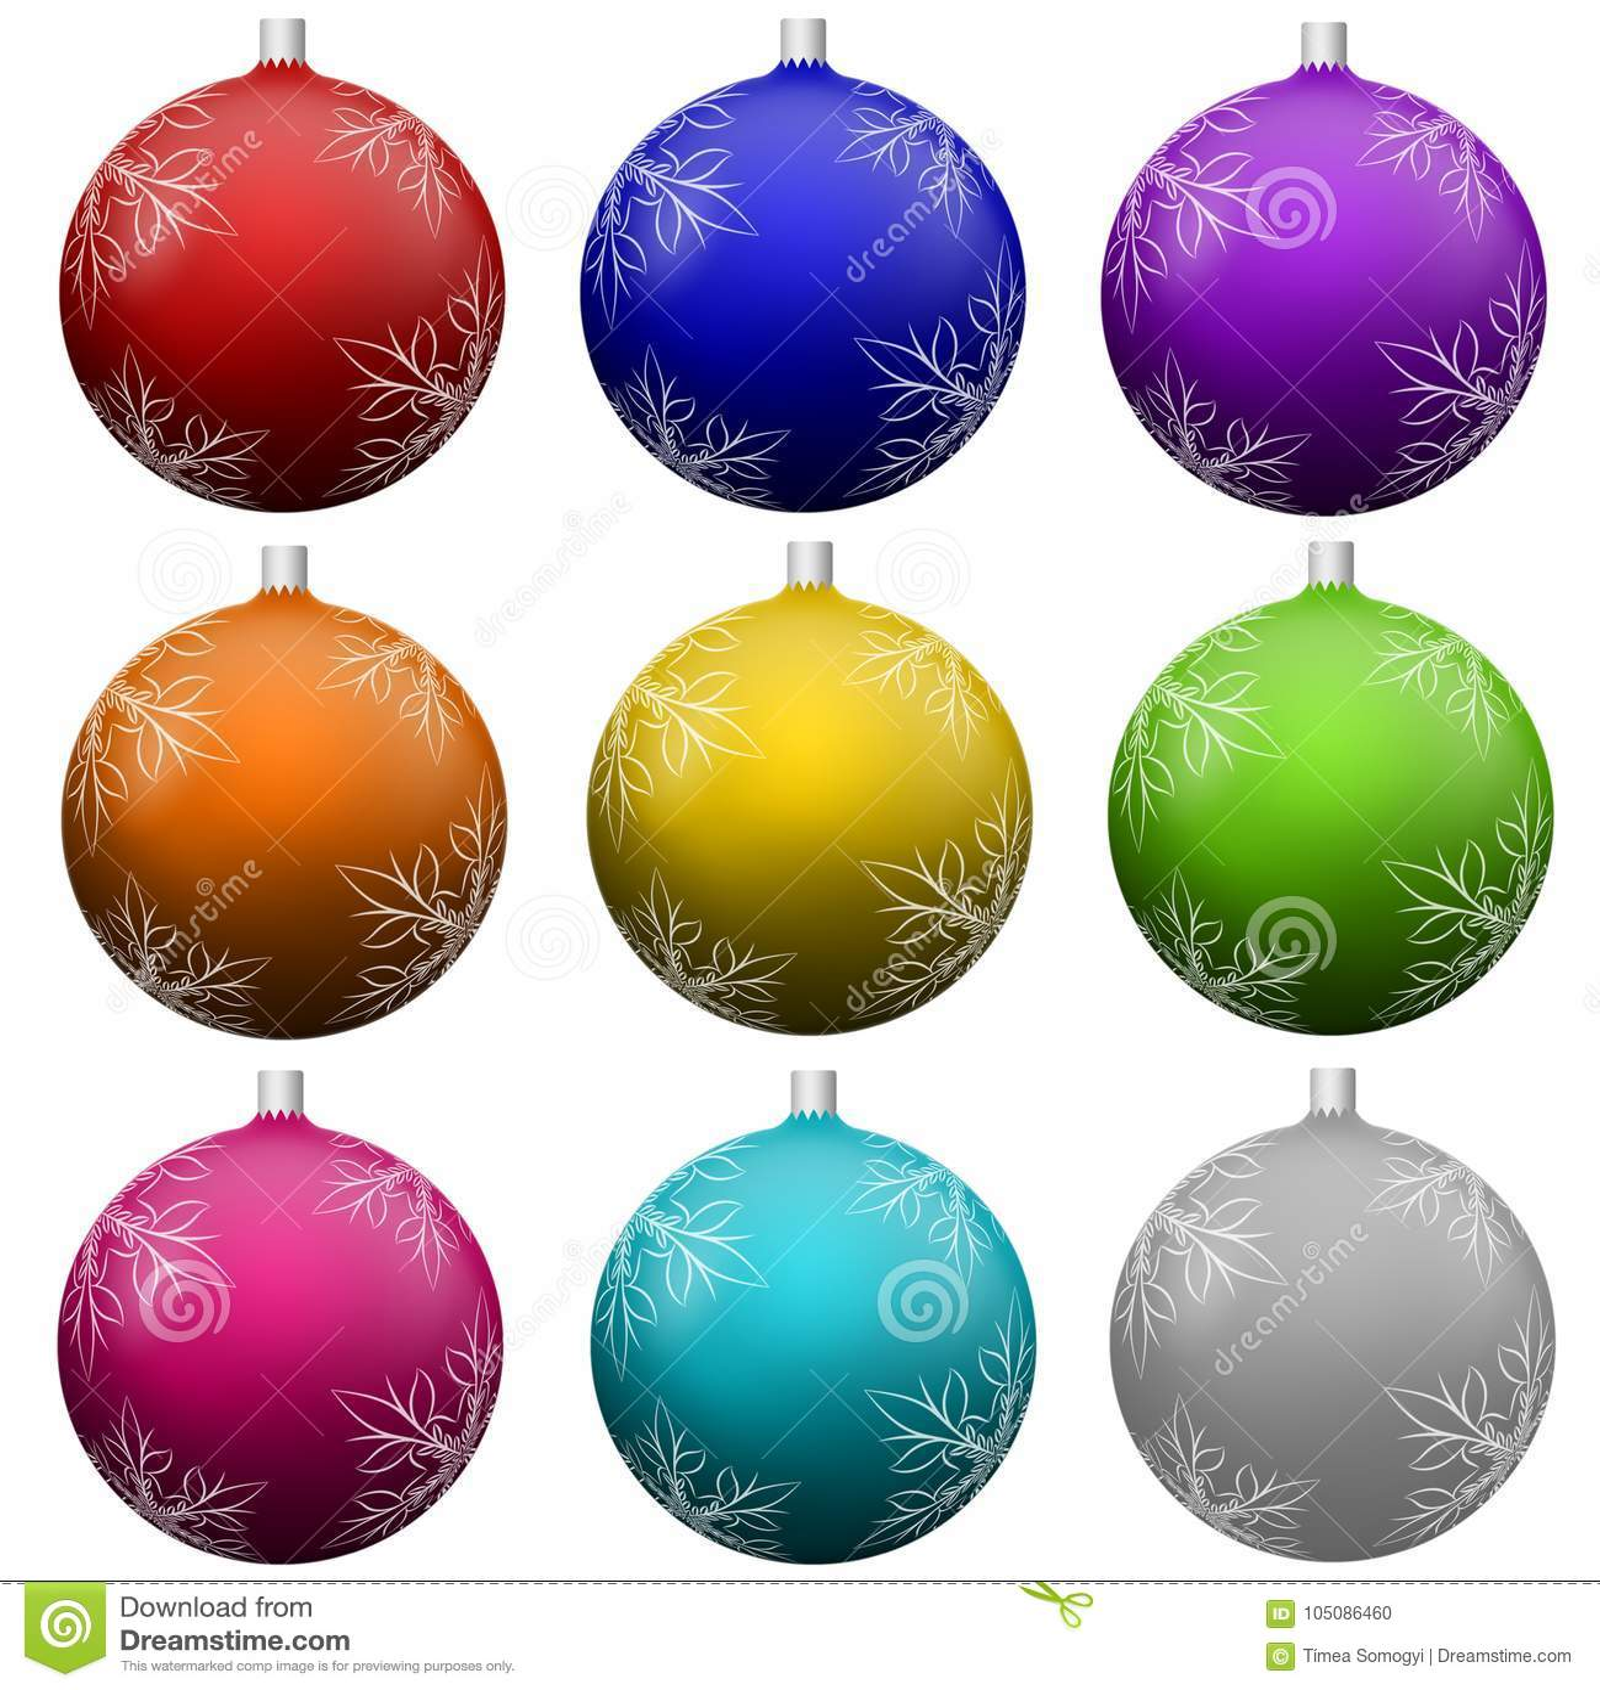 Christmas tree ball ornament set.